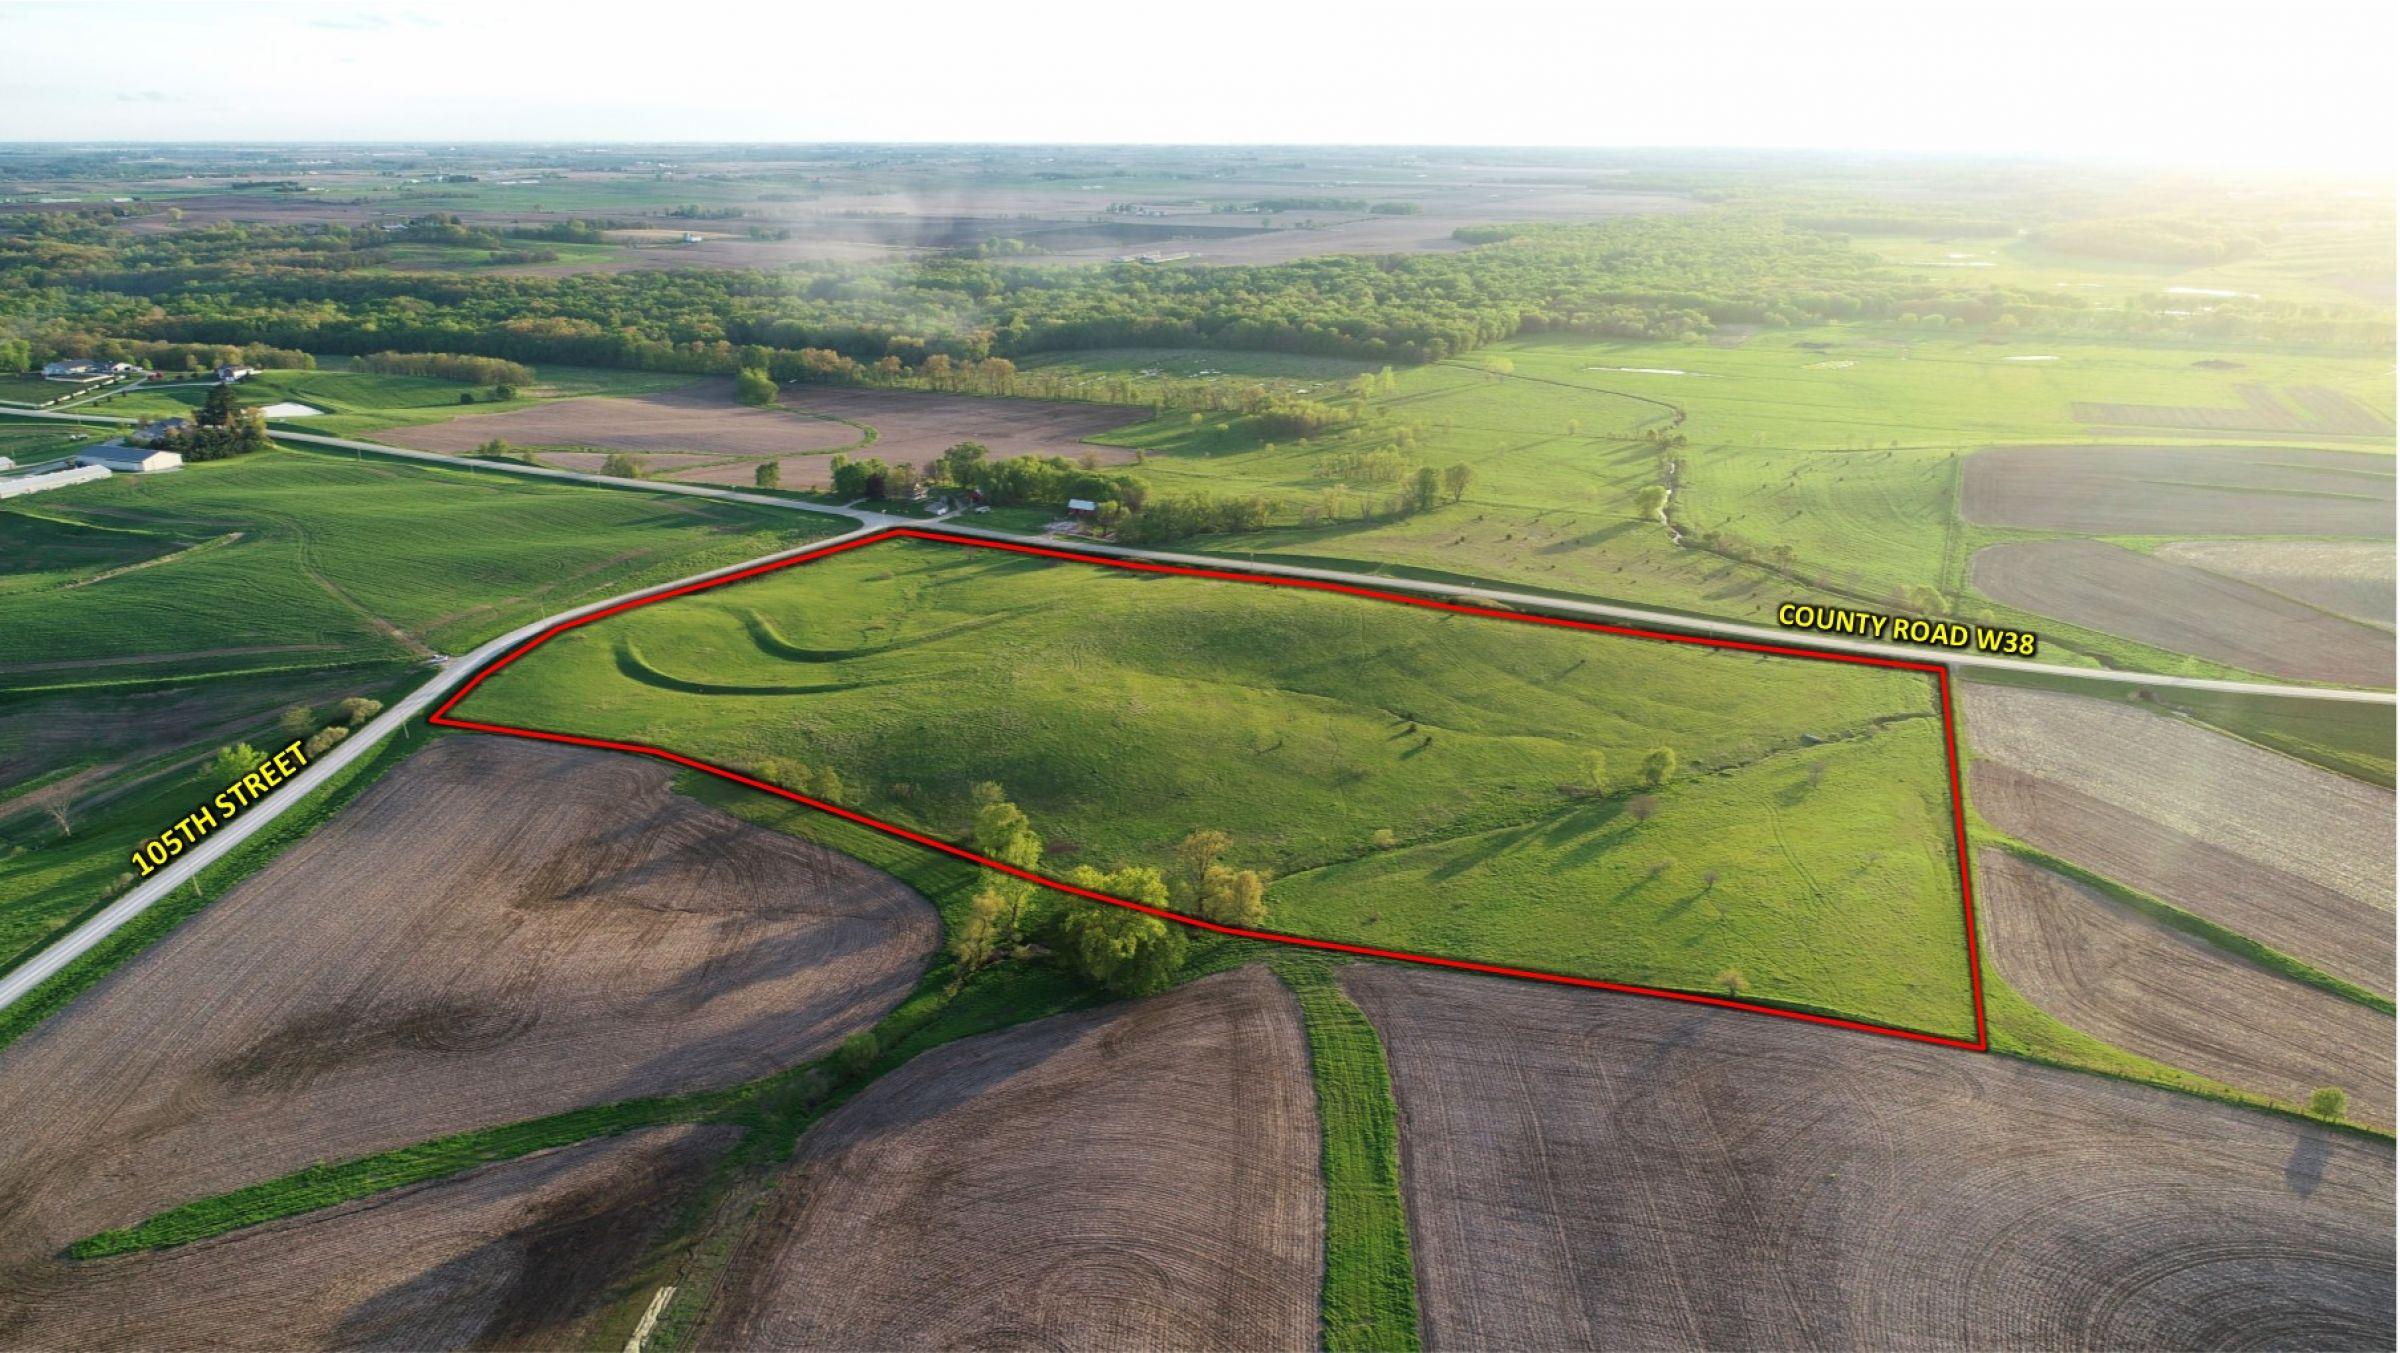 Washington County Iowa Land For Sale 2.jpg